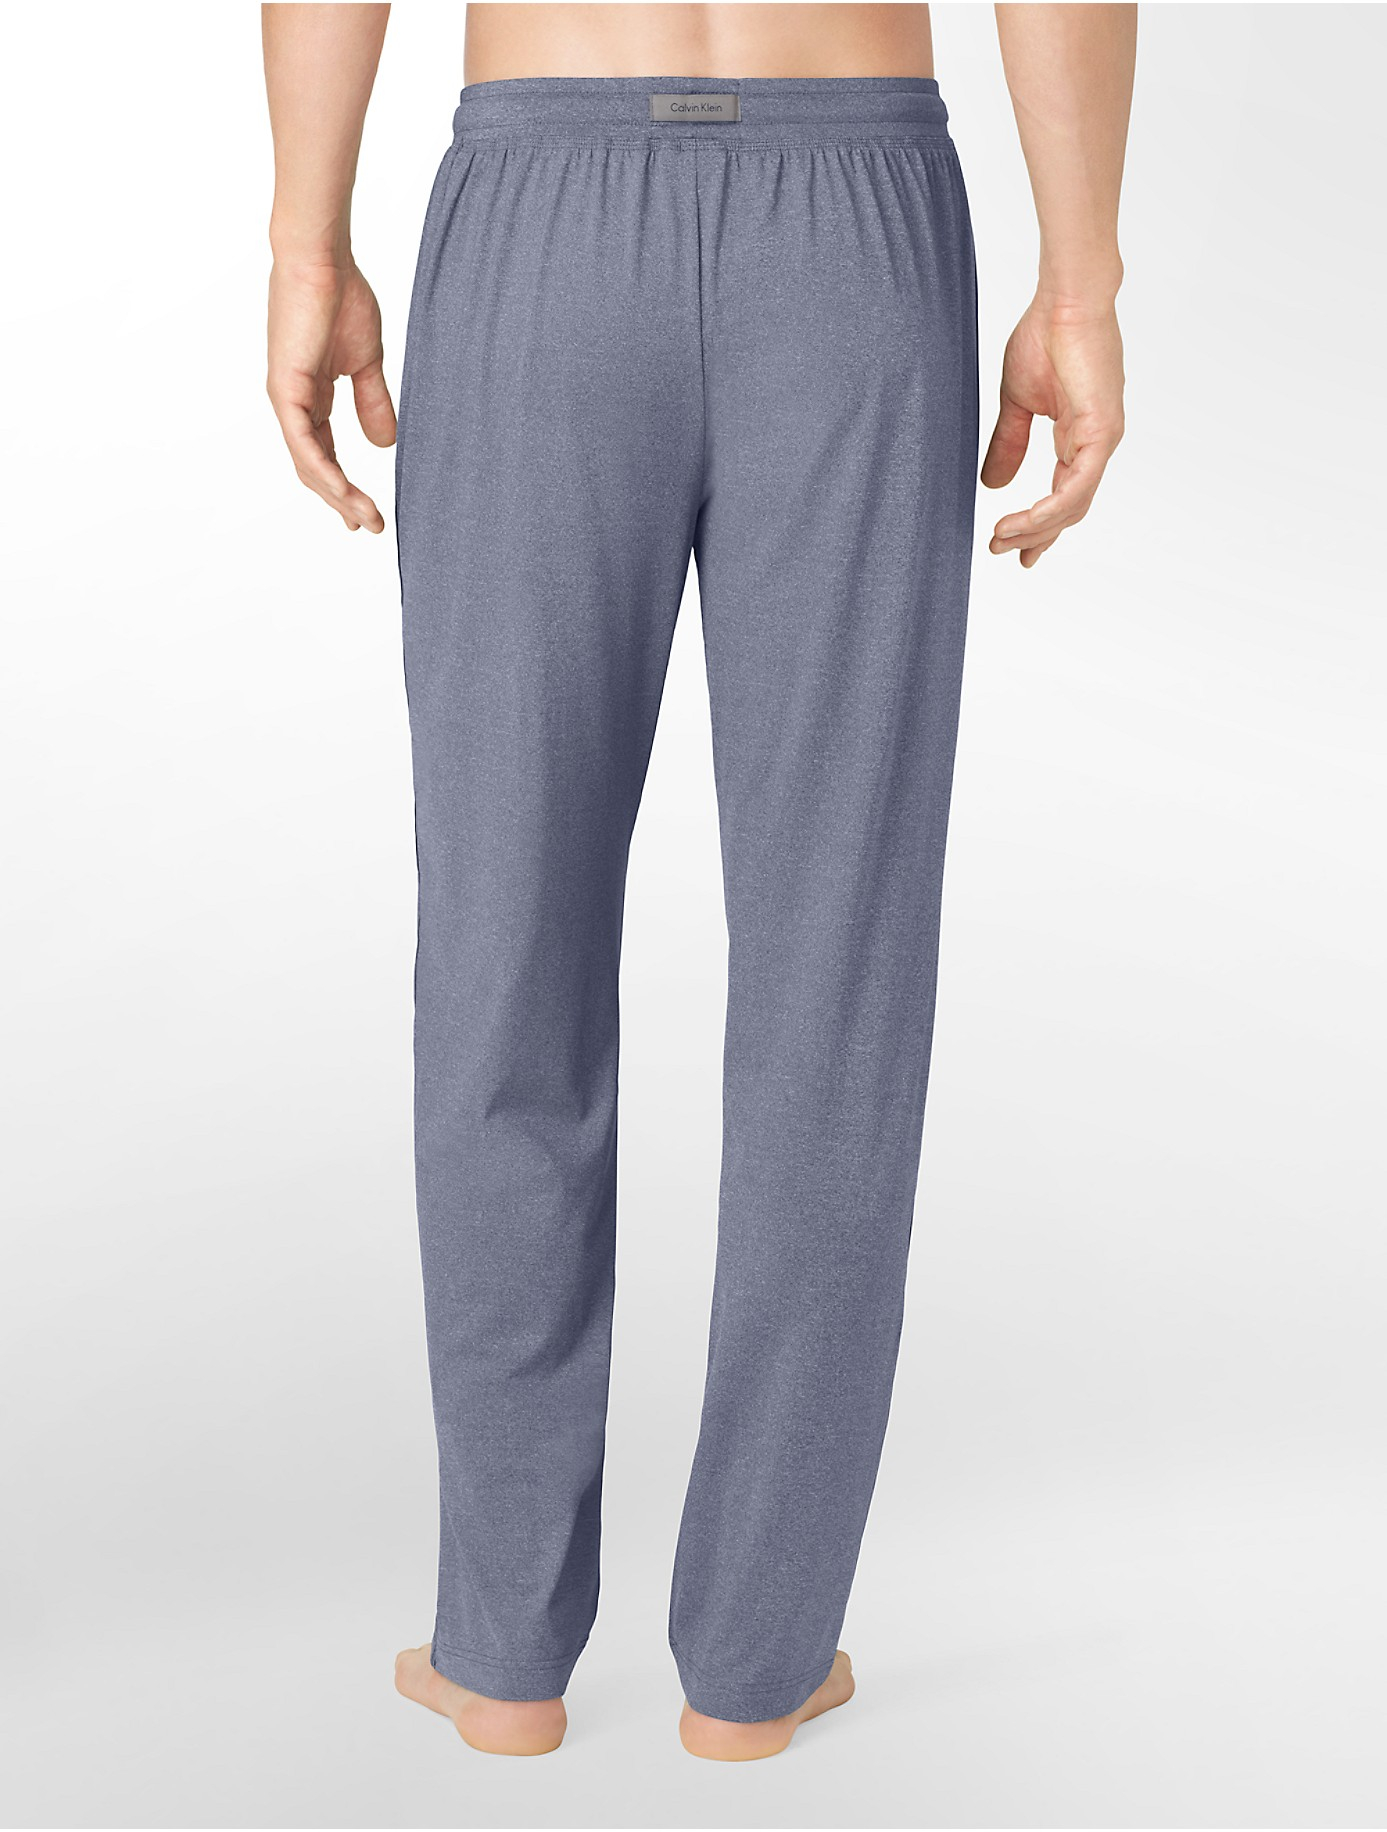 Lyst Calvin Klein Ease Yoga Pants In Blue For Men